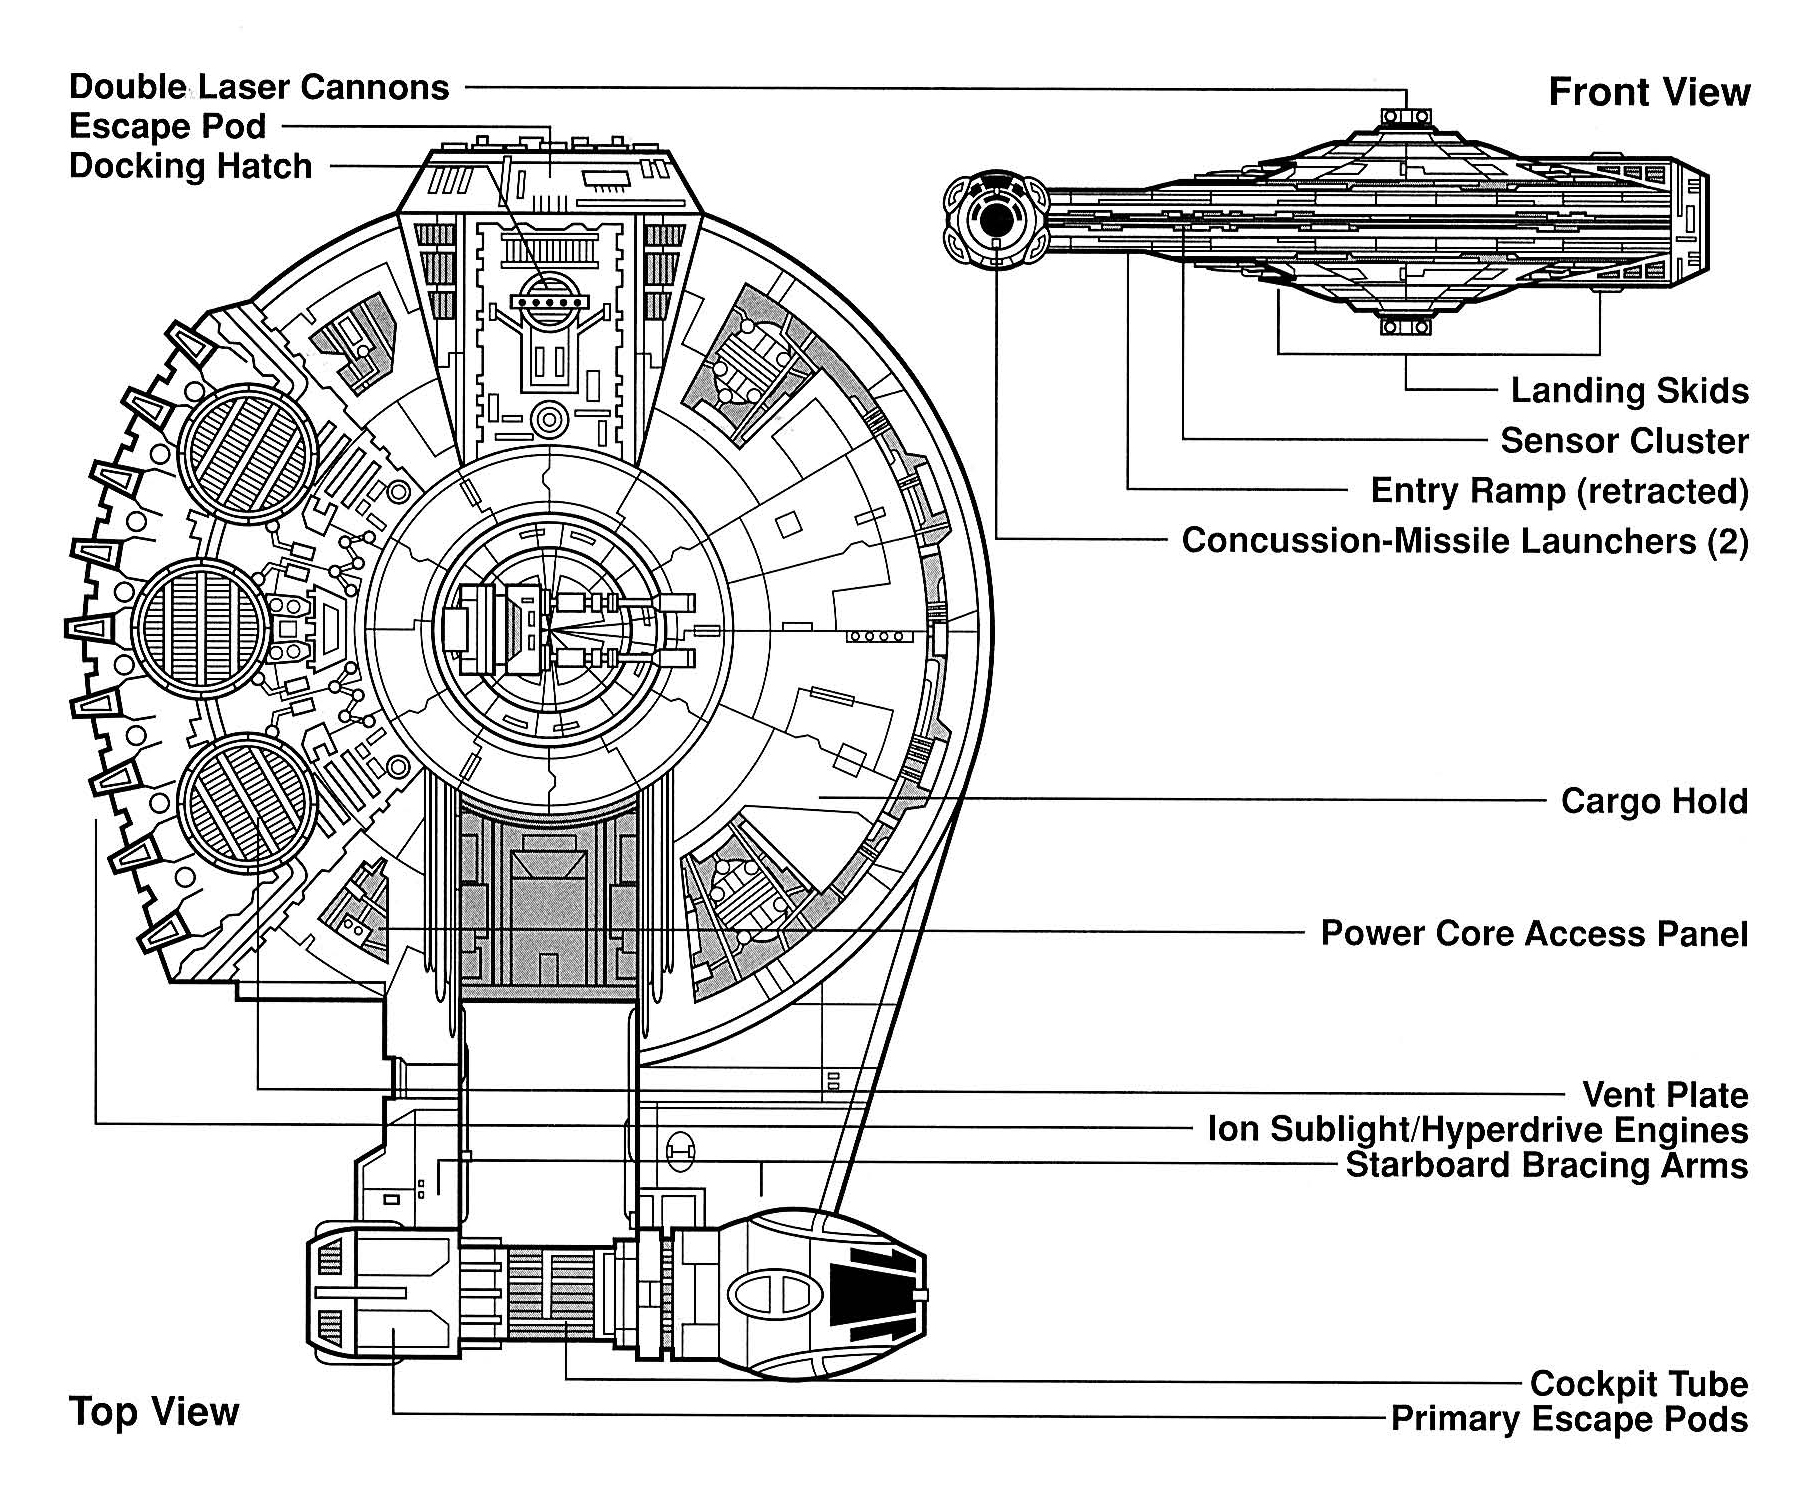 freighter diagrams